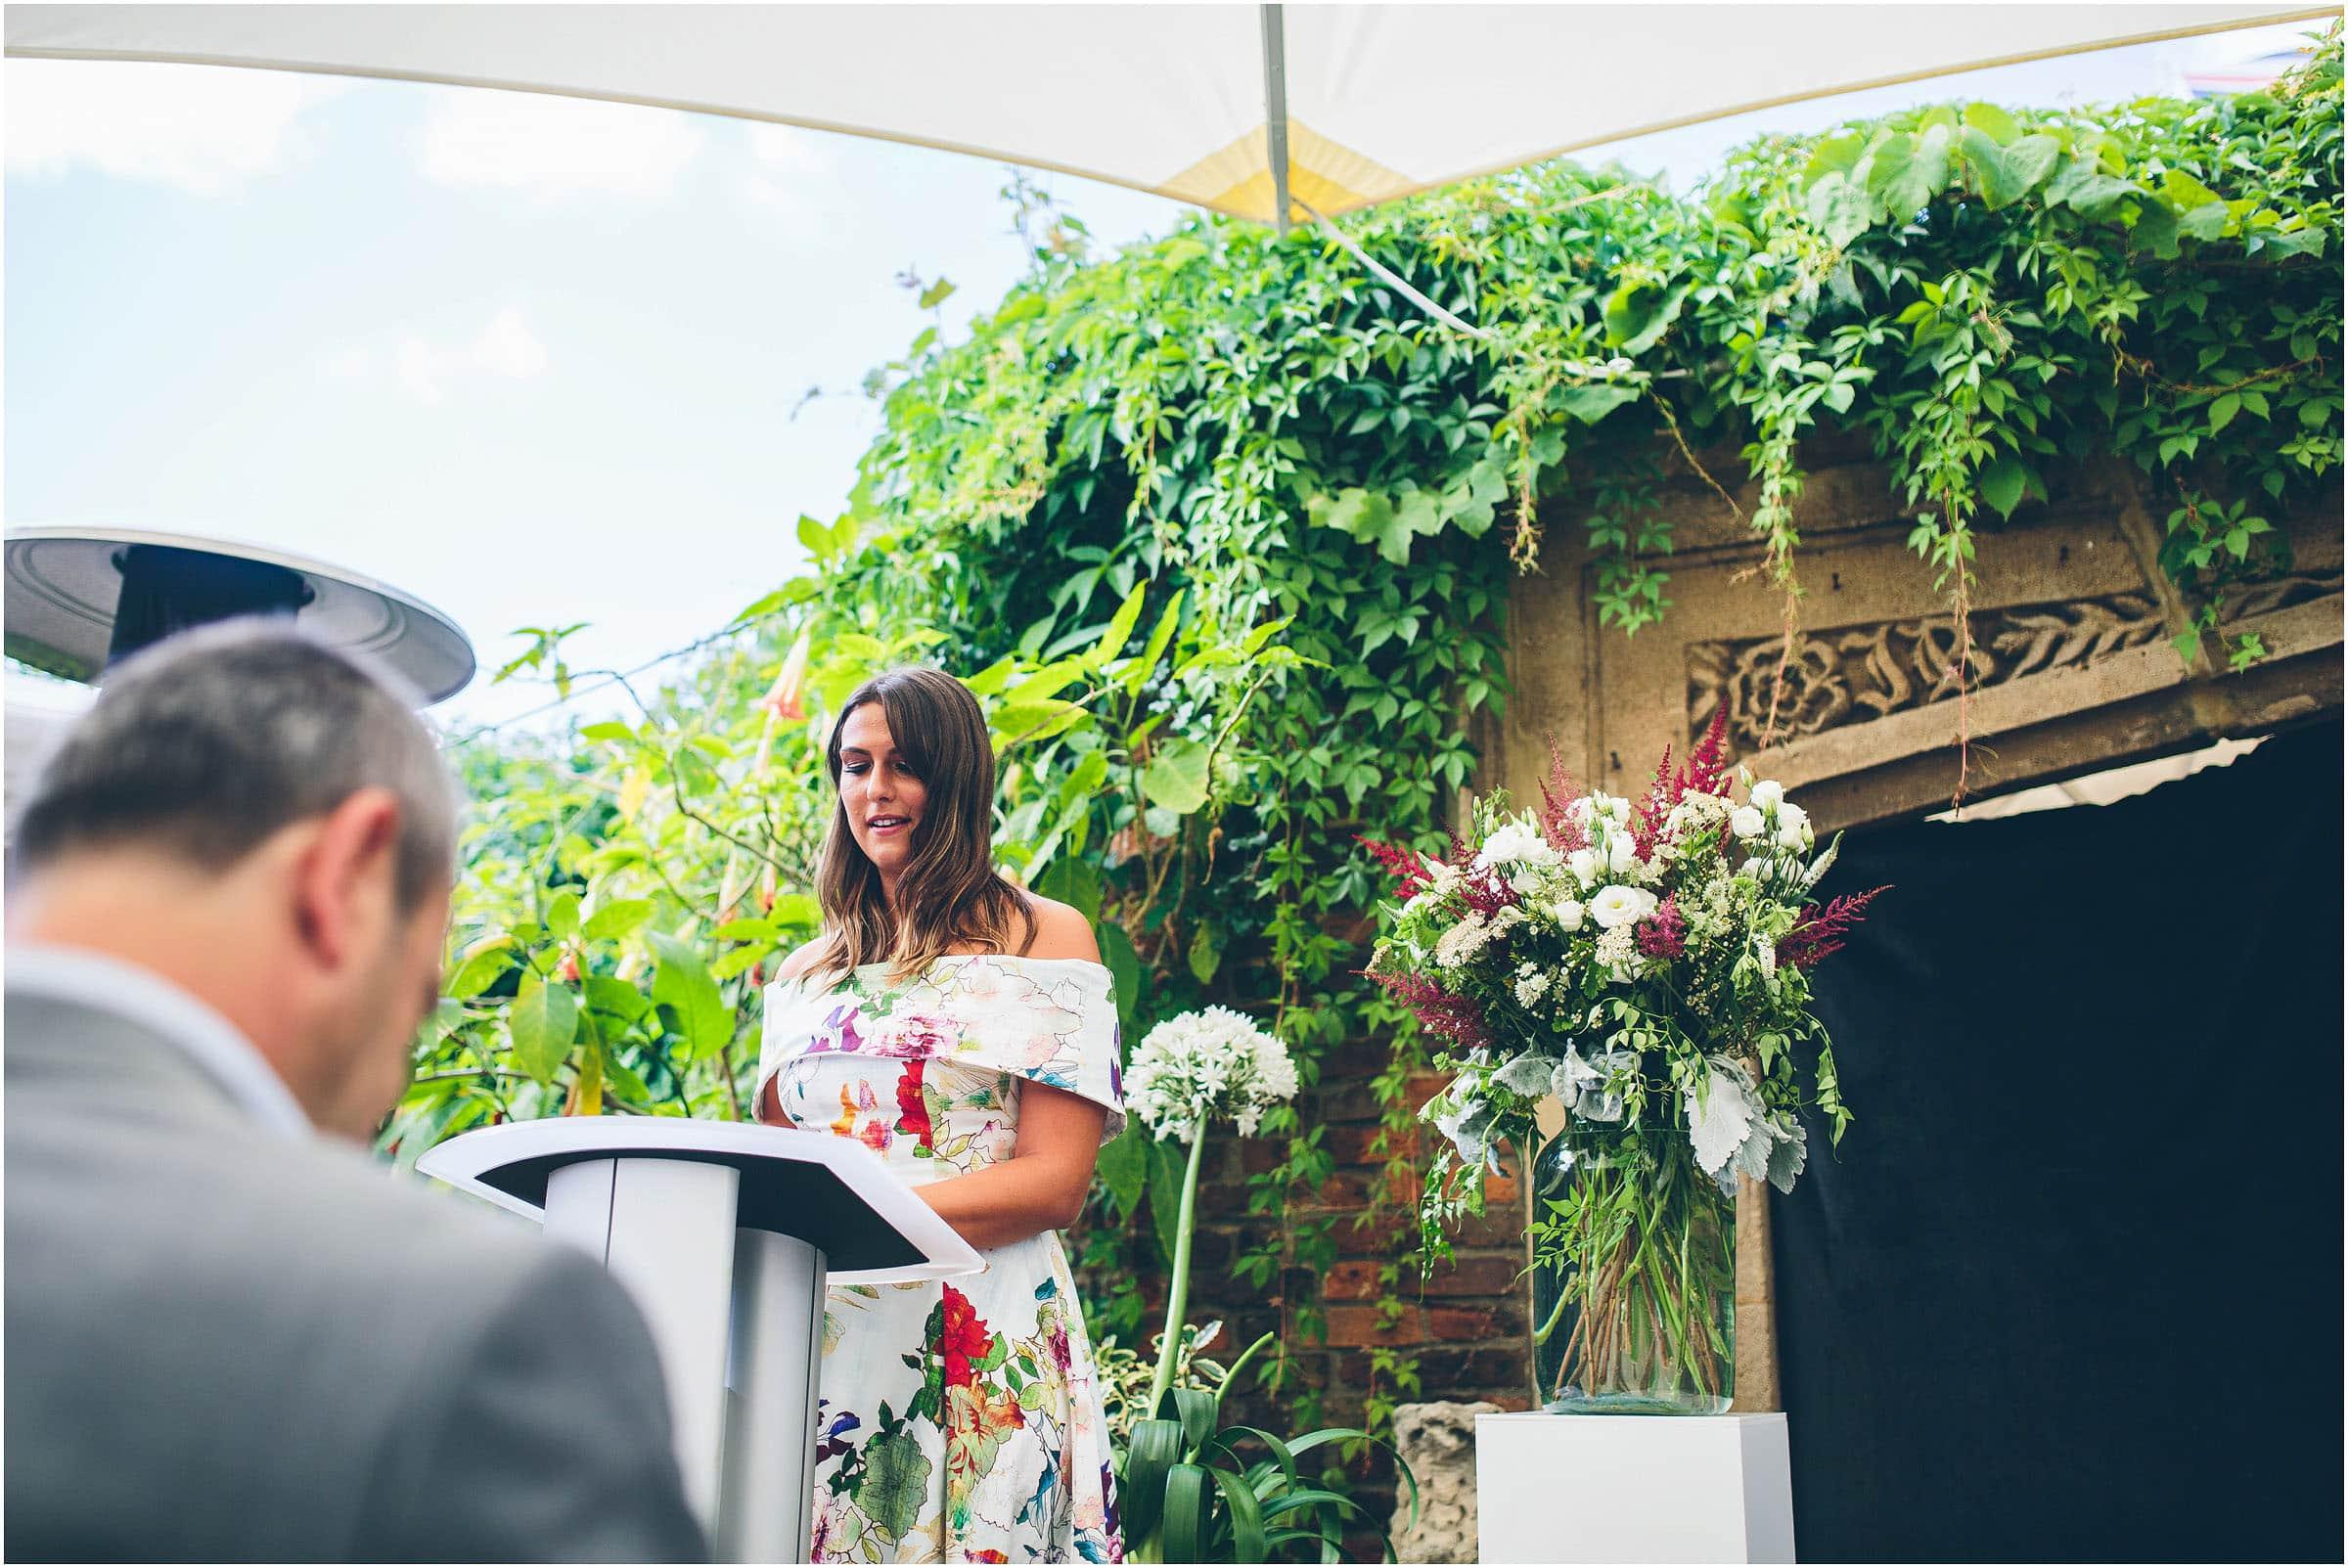 Kensington_Roof_Gardens_Wedding_Photography_0030